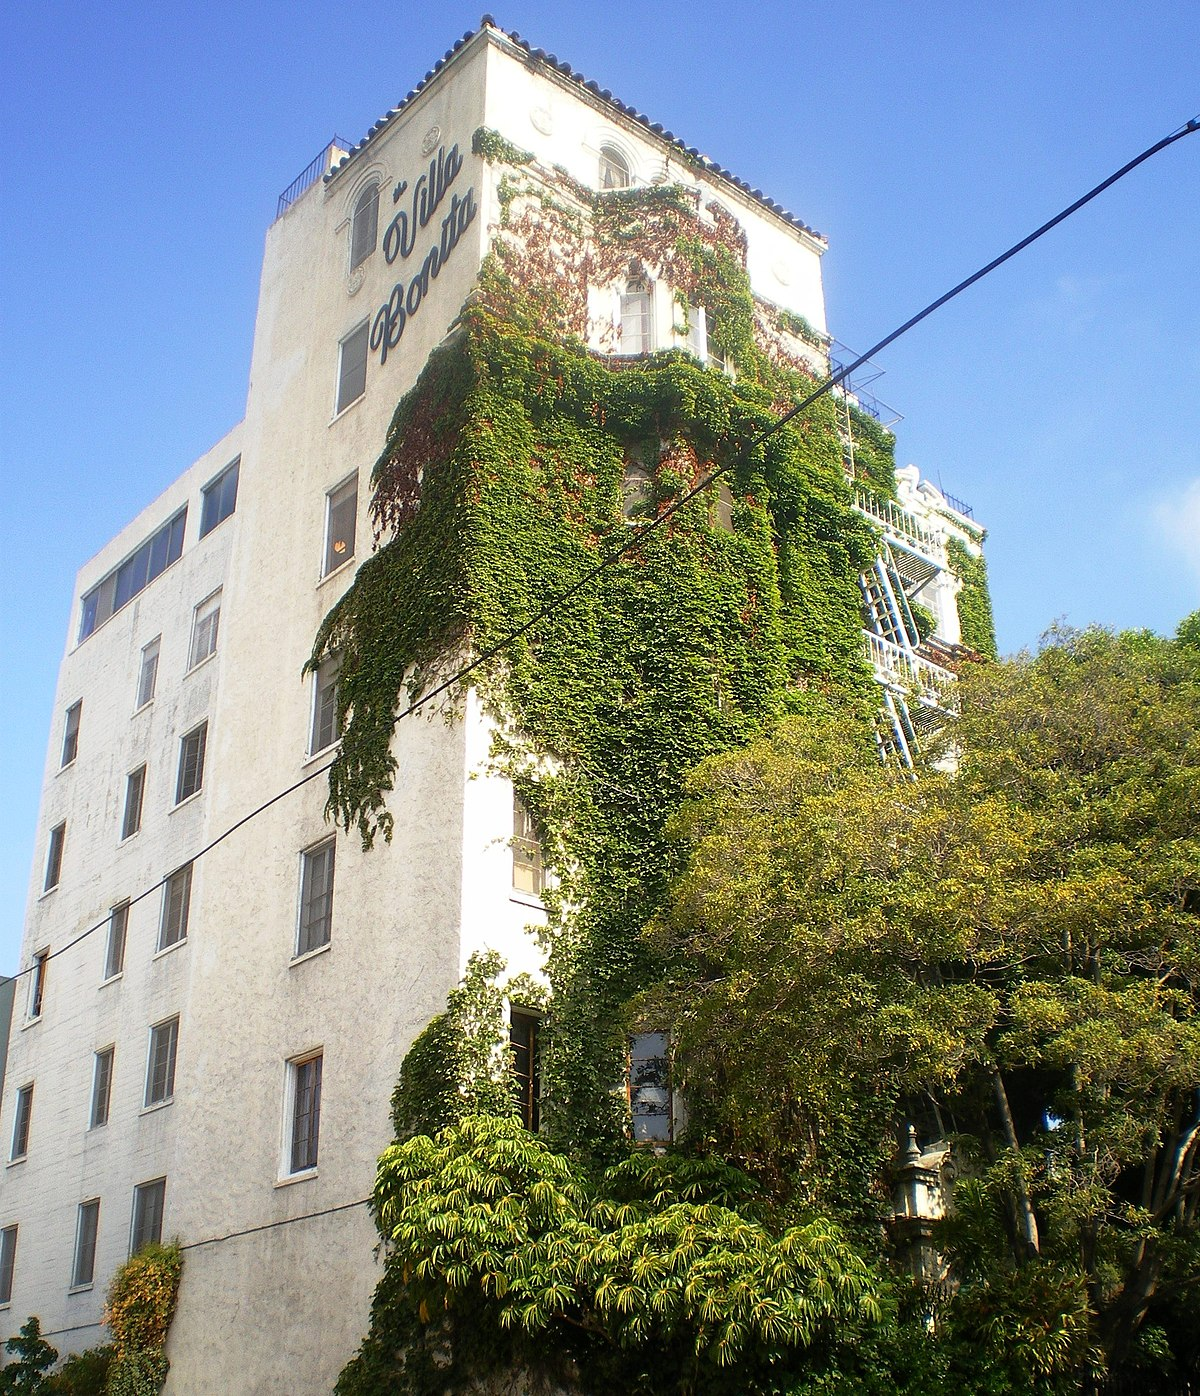 Villa bonita wikipedia for Villa bonita precios